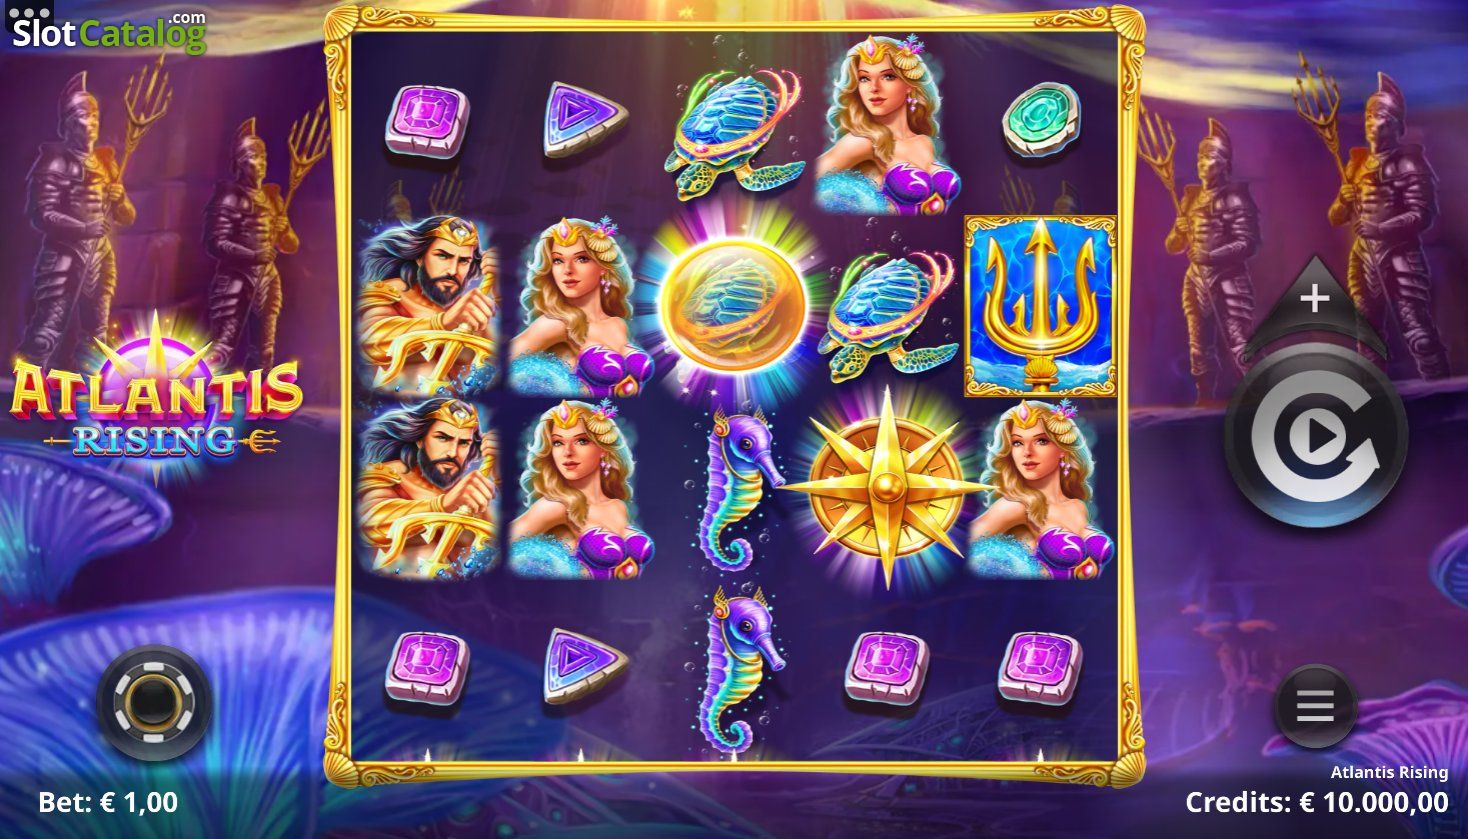 Atlantis Rising Slot ᐈ Review, RTP, Variance. Play for Free ?